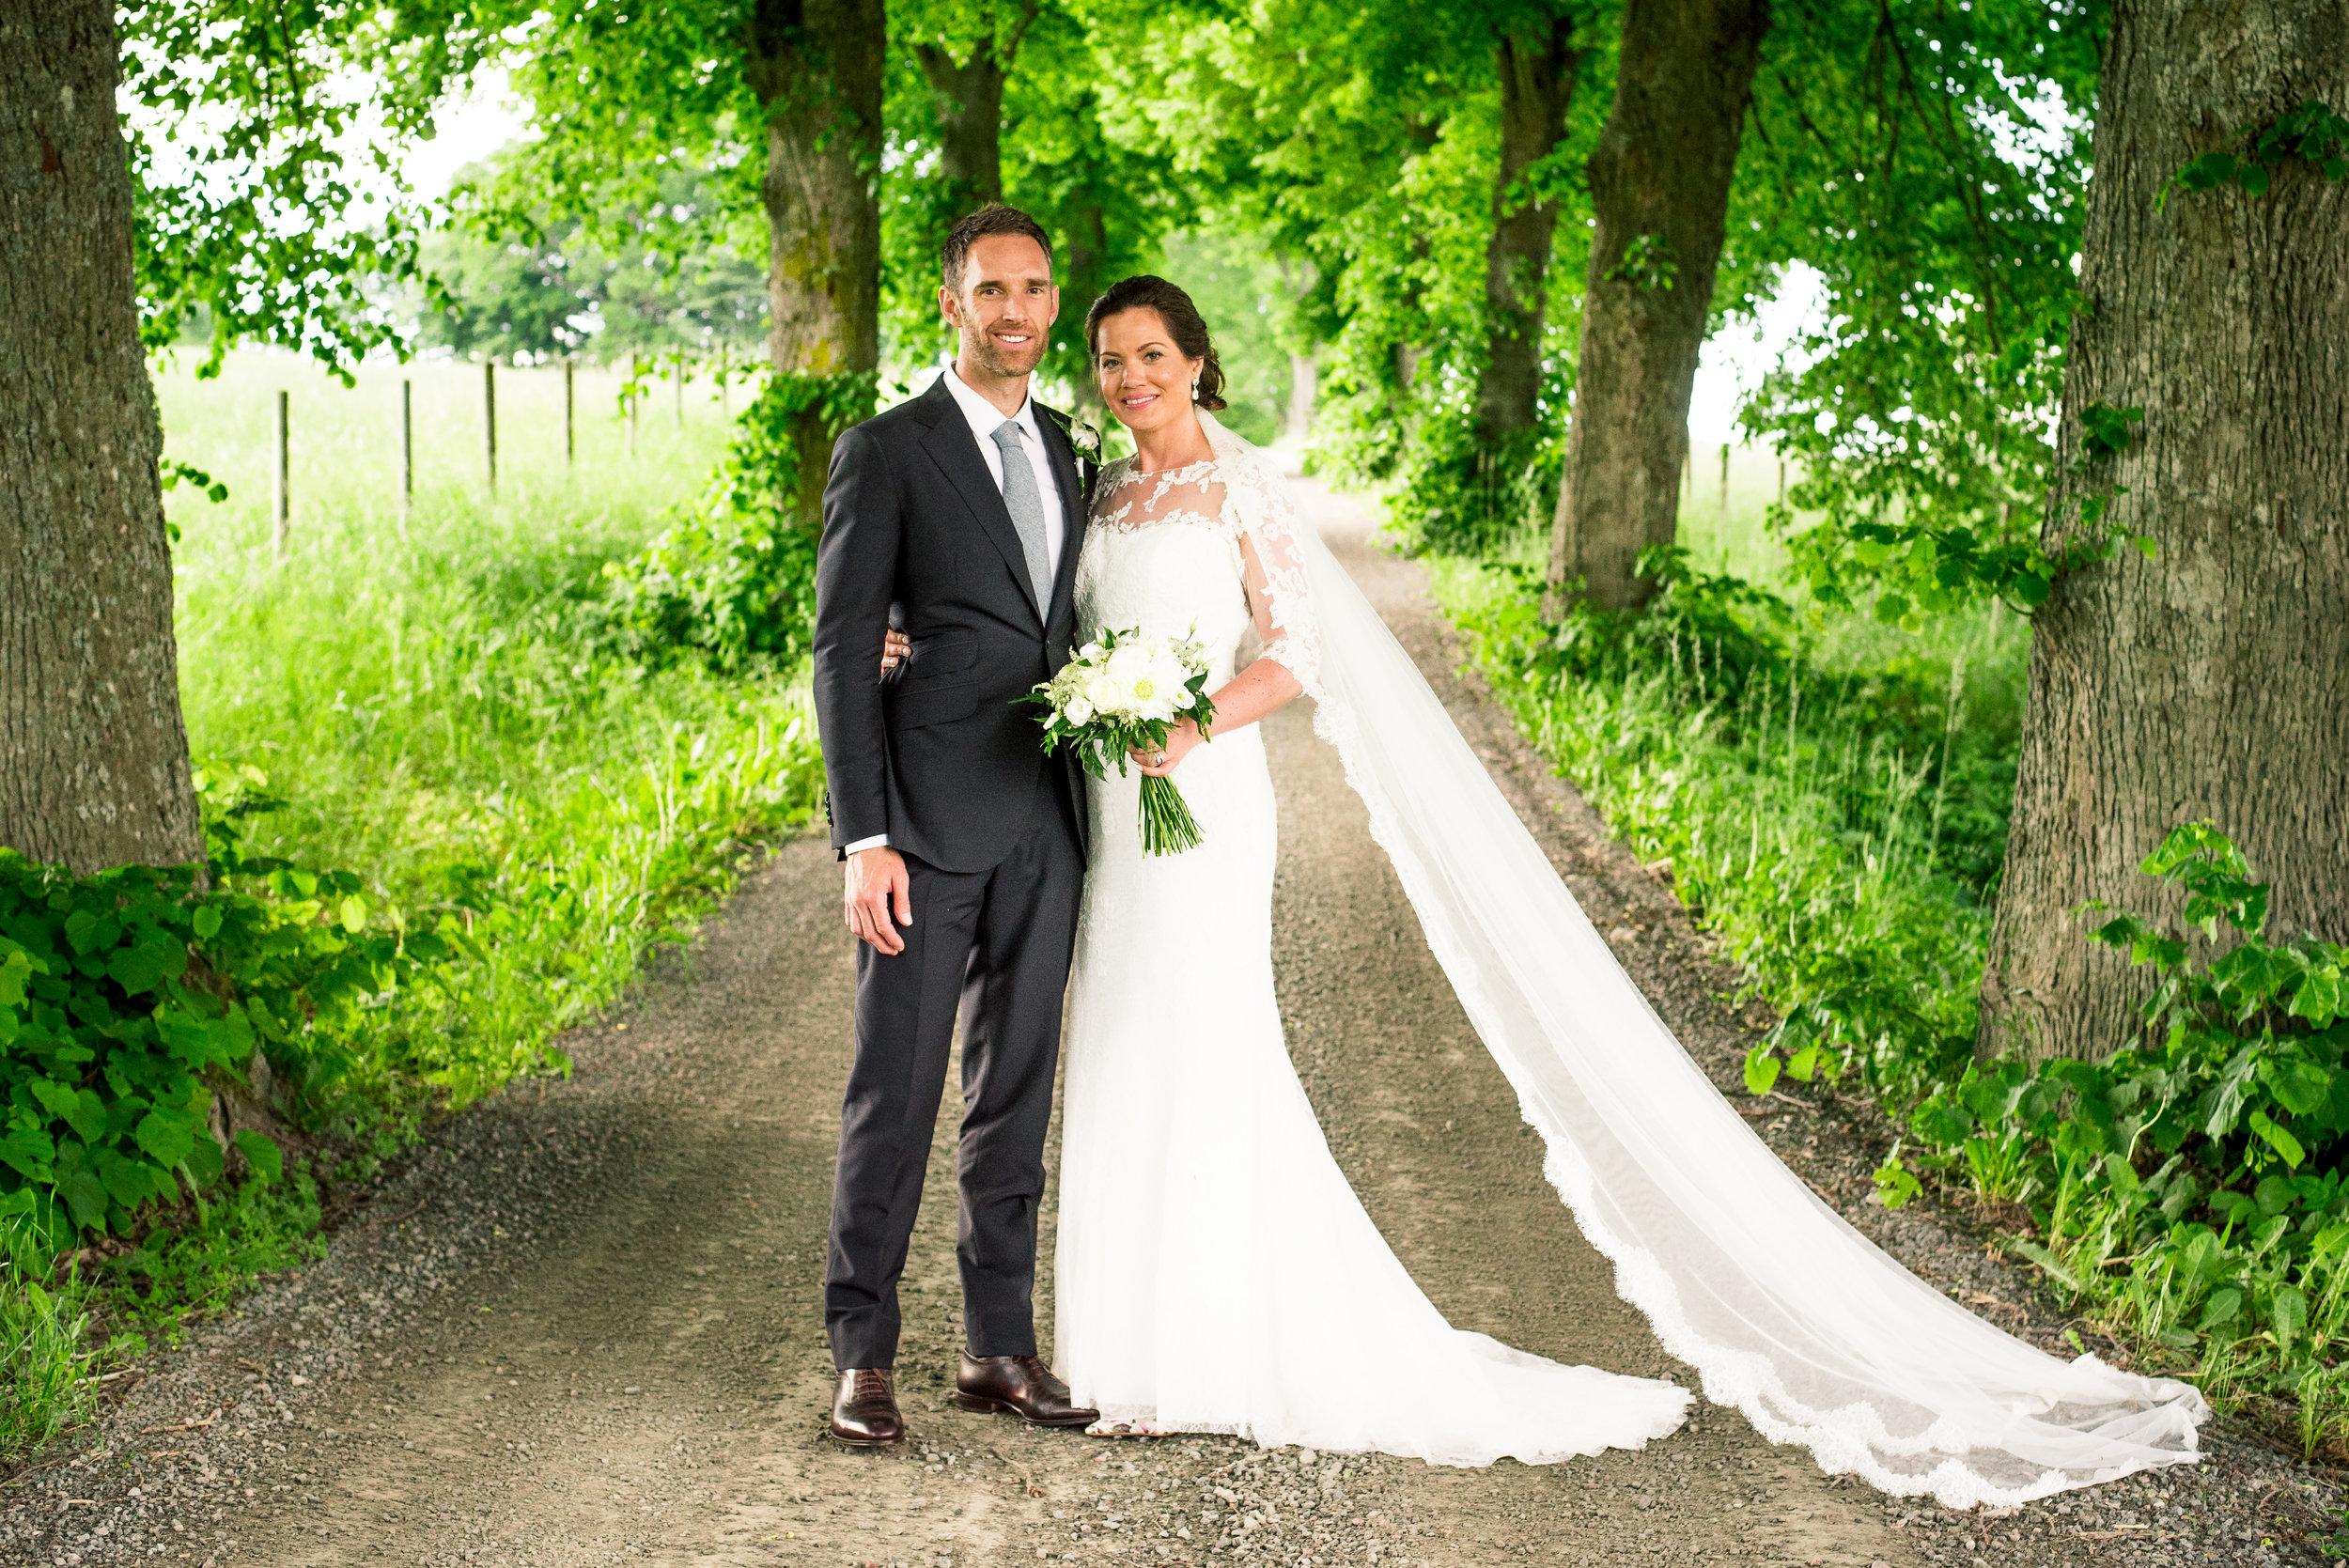 dejta Bröllops fotografier